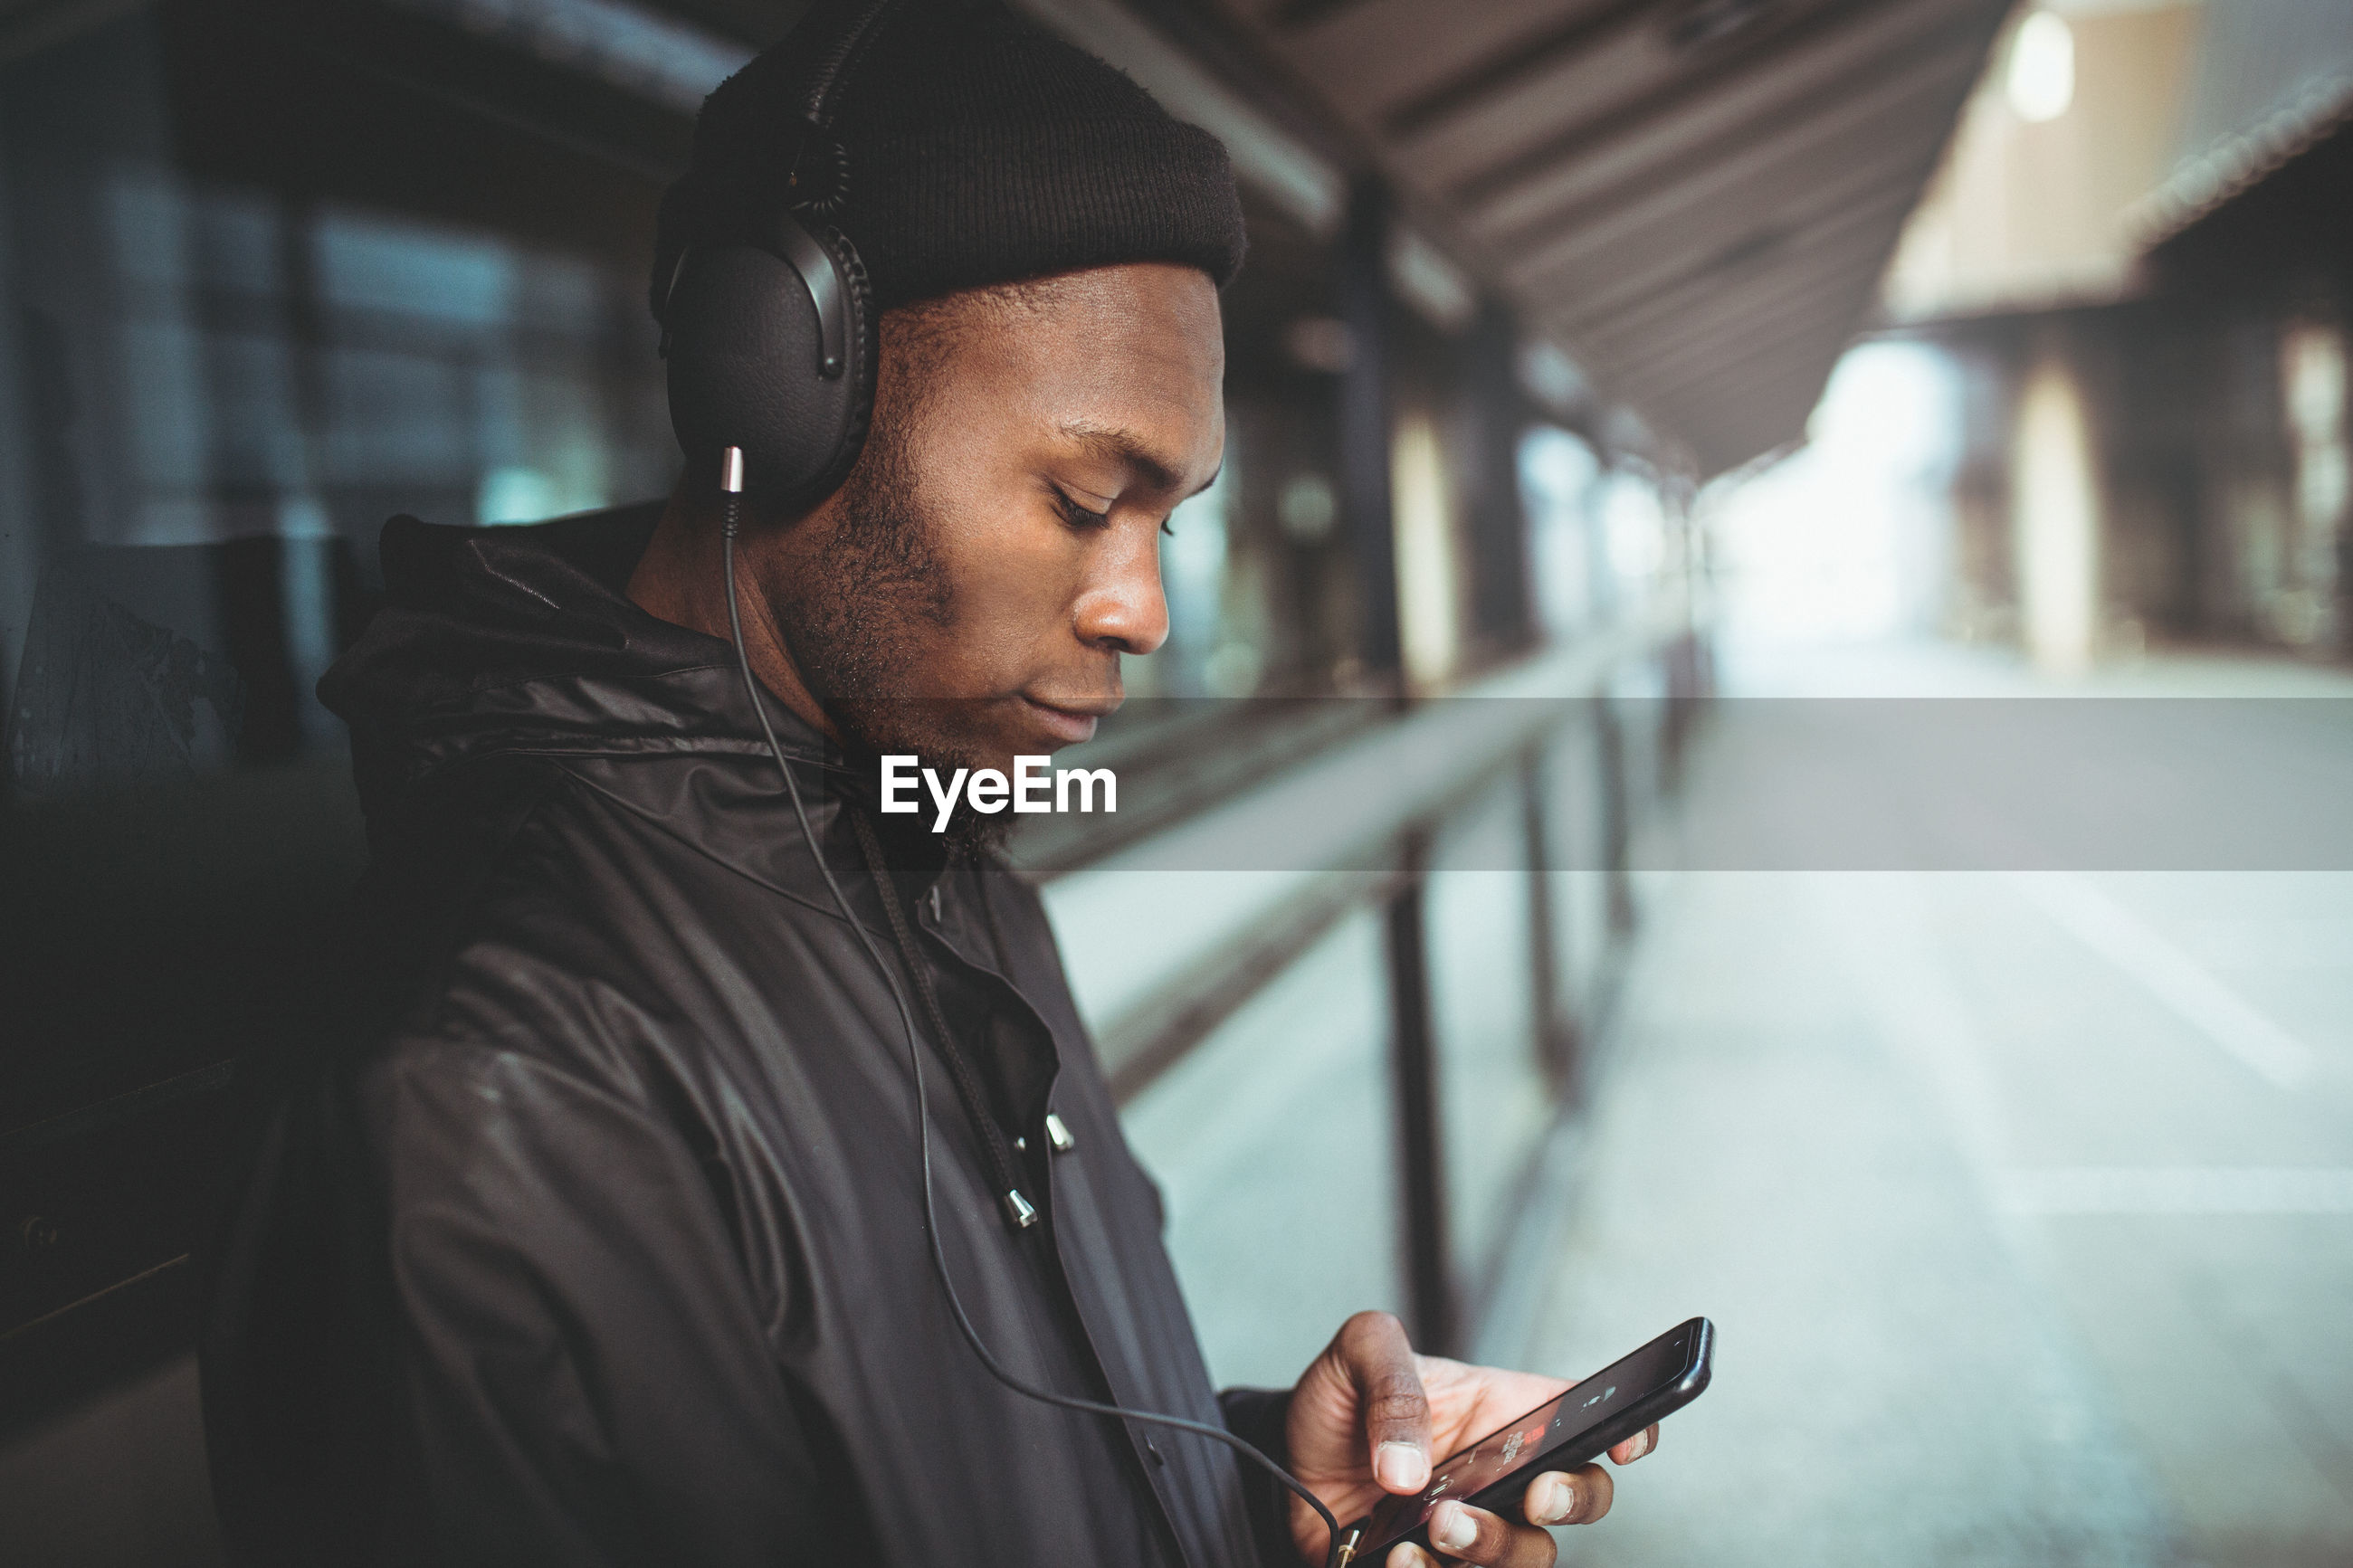 Man listening music on headphones while leaning on window